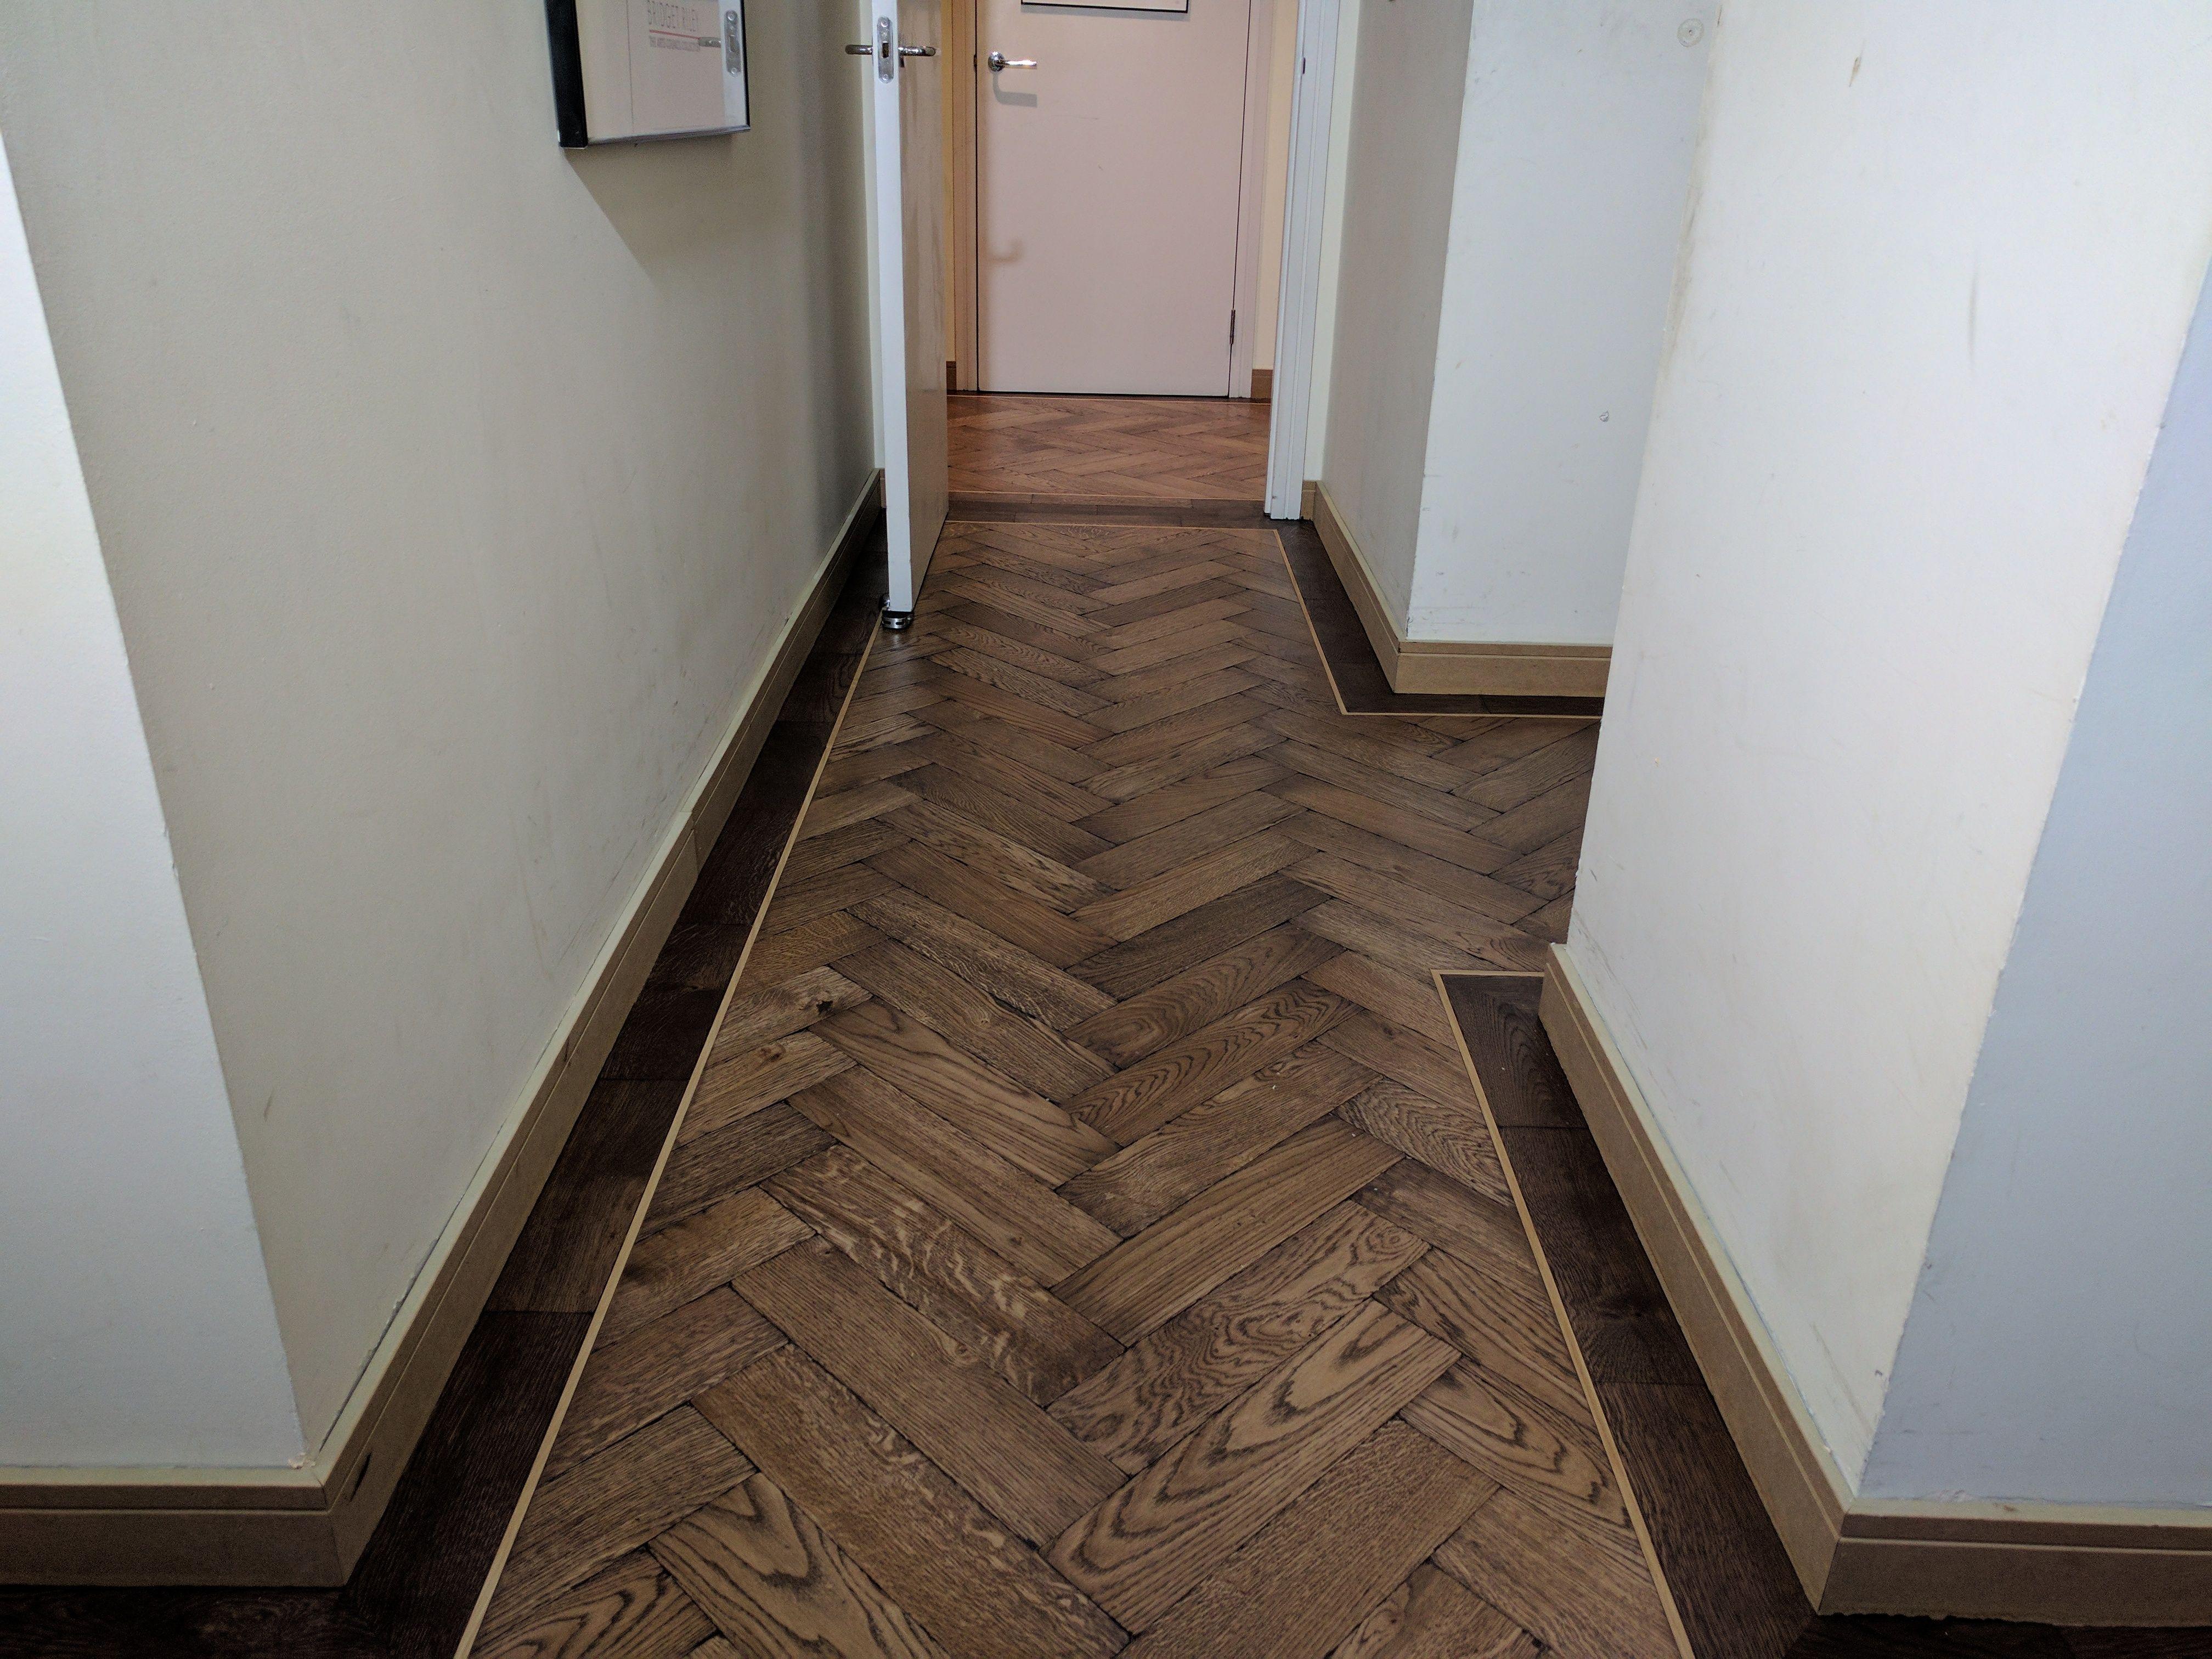 We fitted this dark parquet wood floor in a herringbone